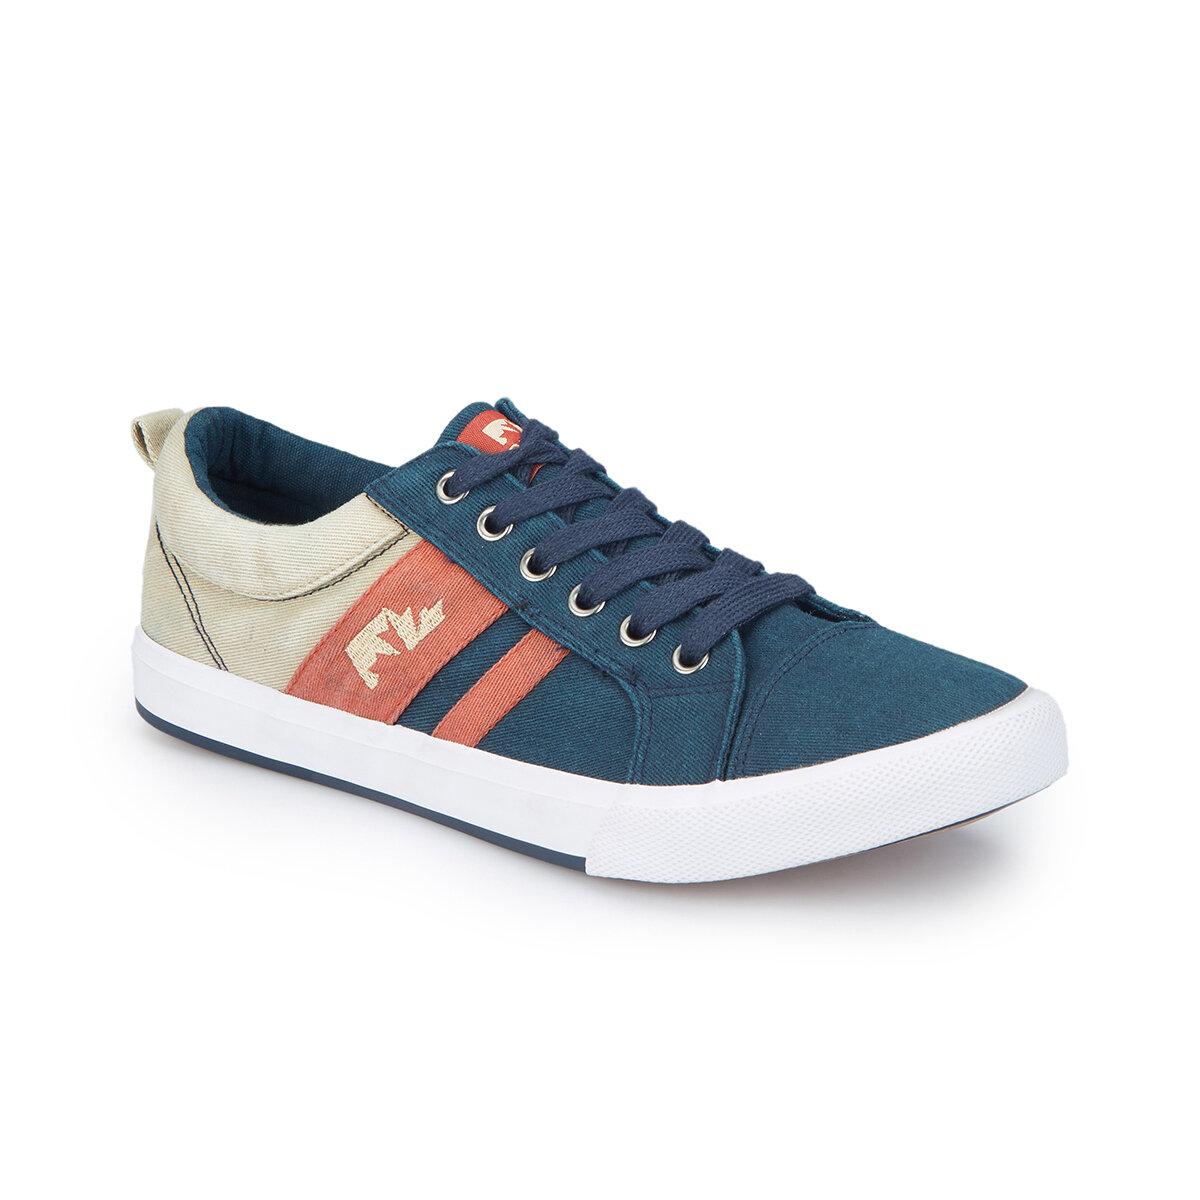 FLO GALE Navy Blue Men 'S Sneaker Shoes LUMBERJACK